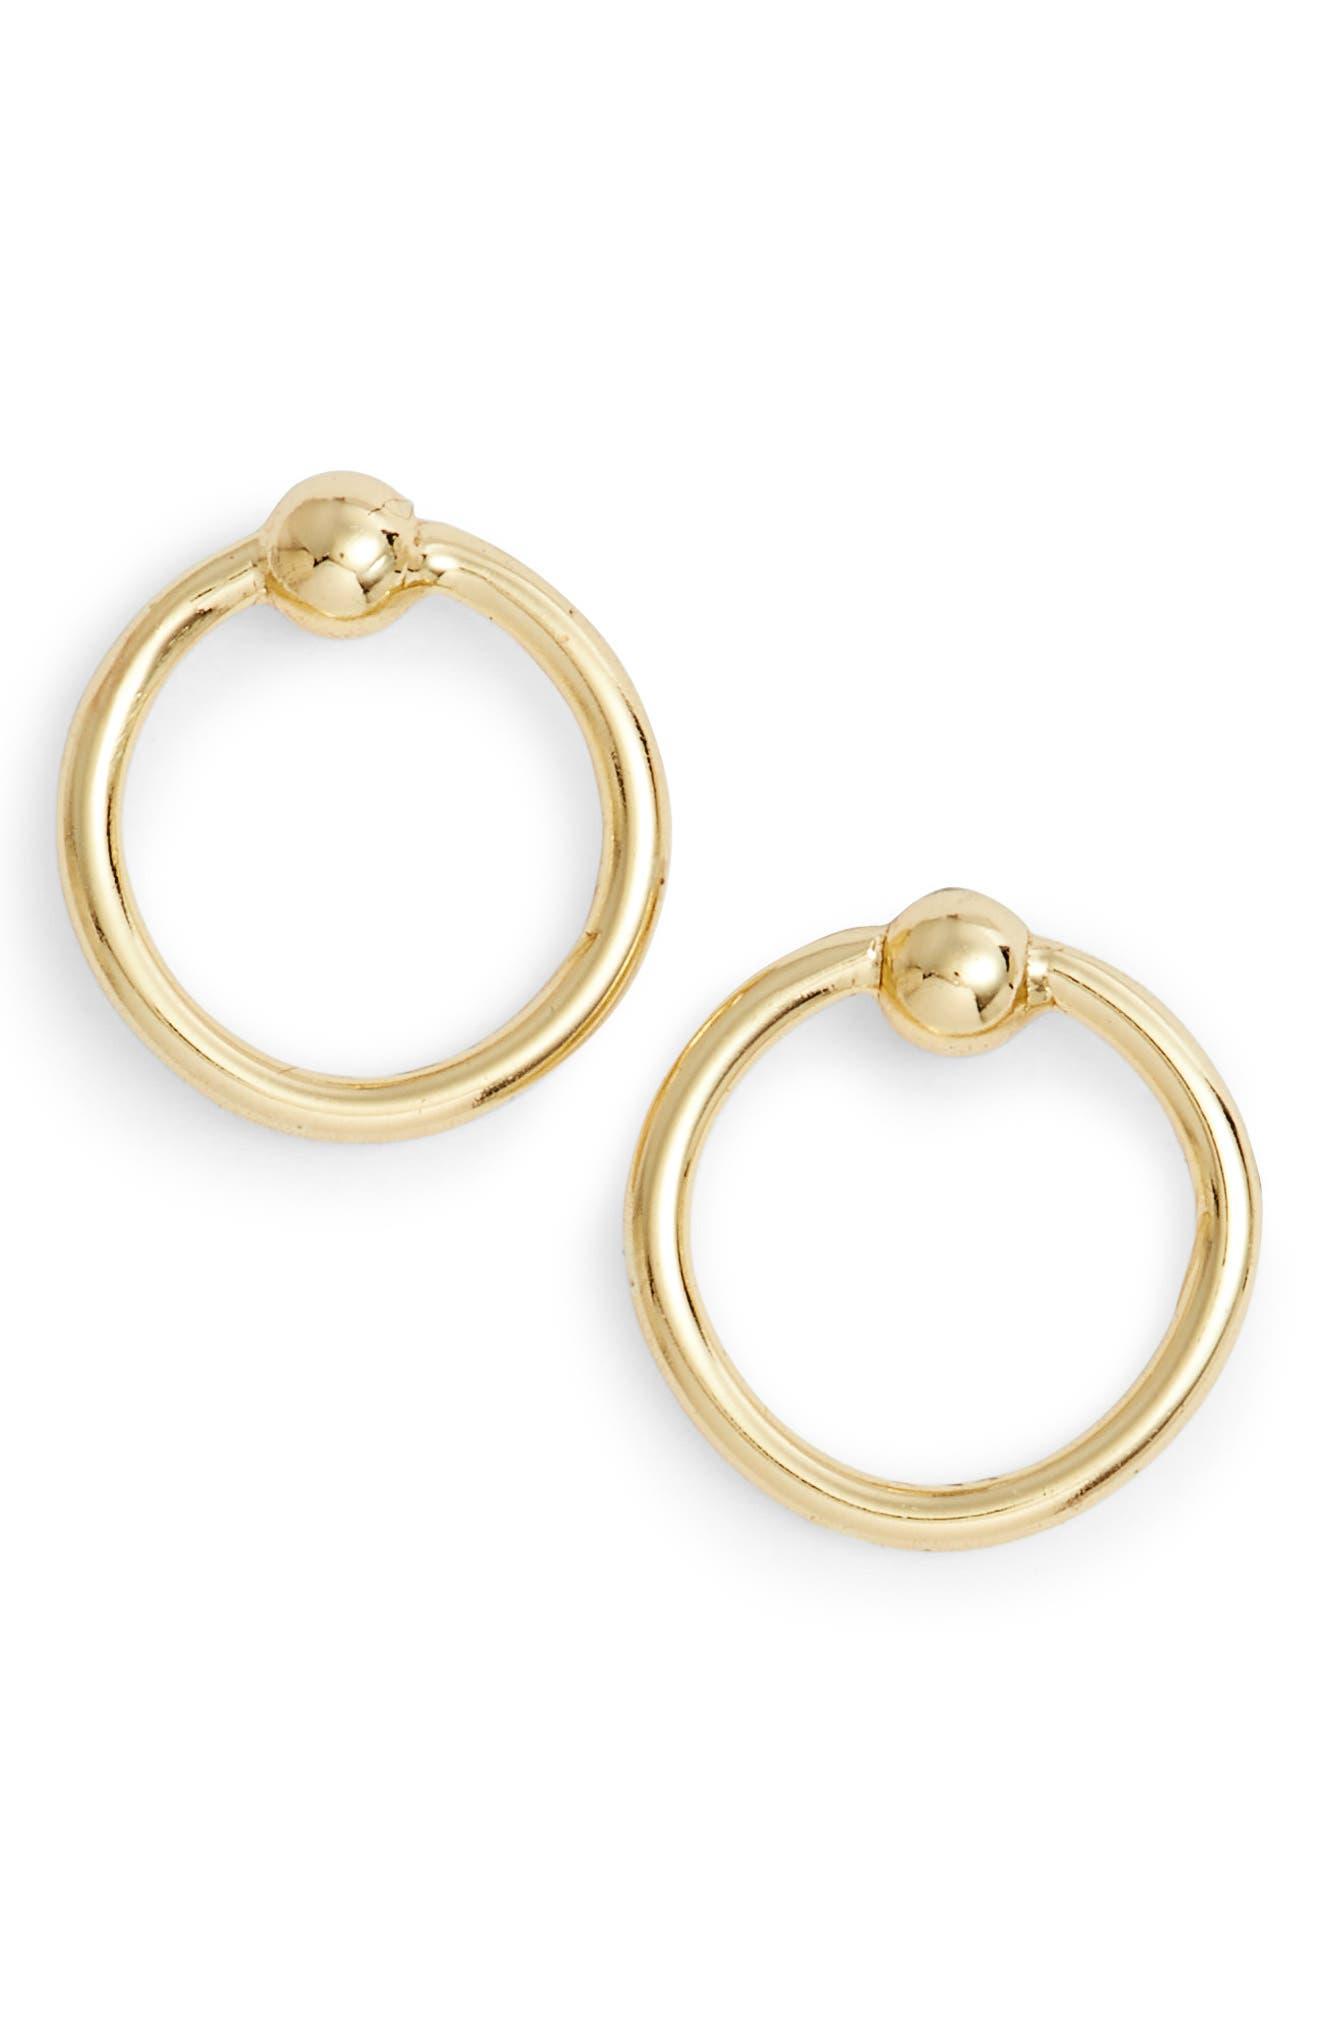 Argento Vivo Stationed Open Ring Stud Earrings